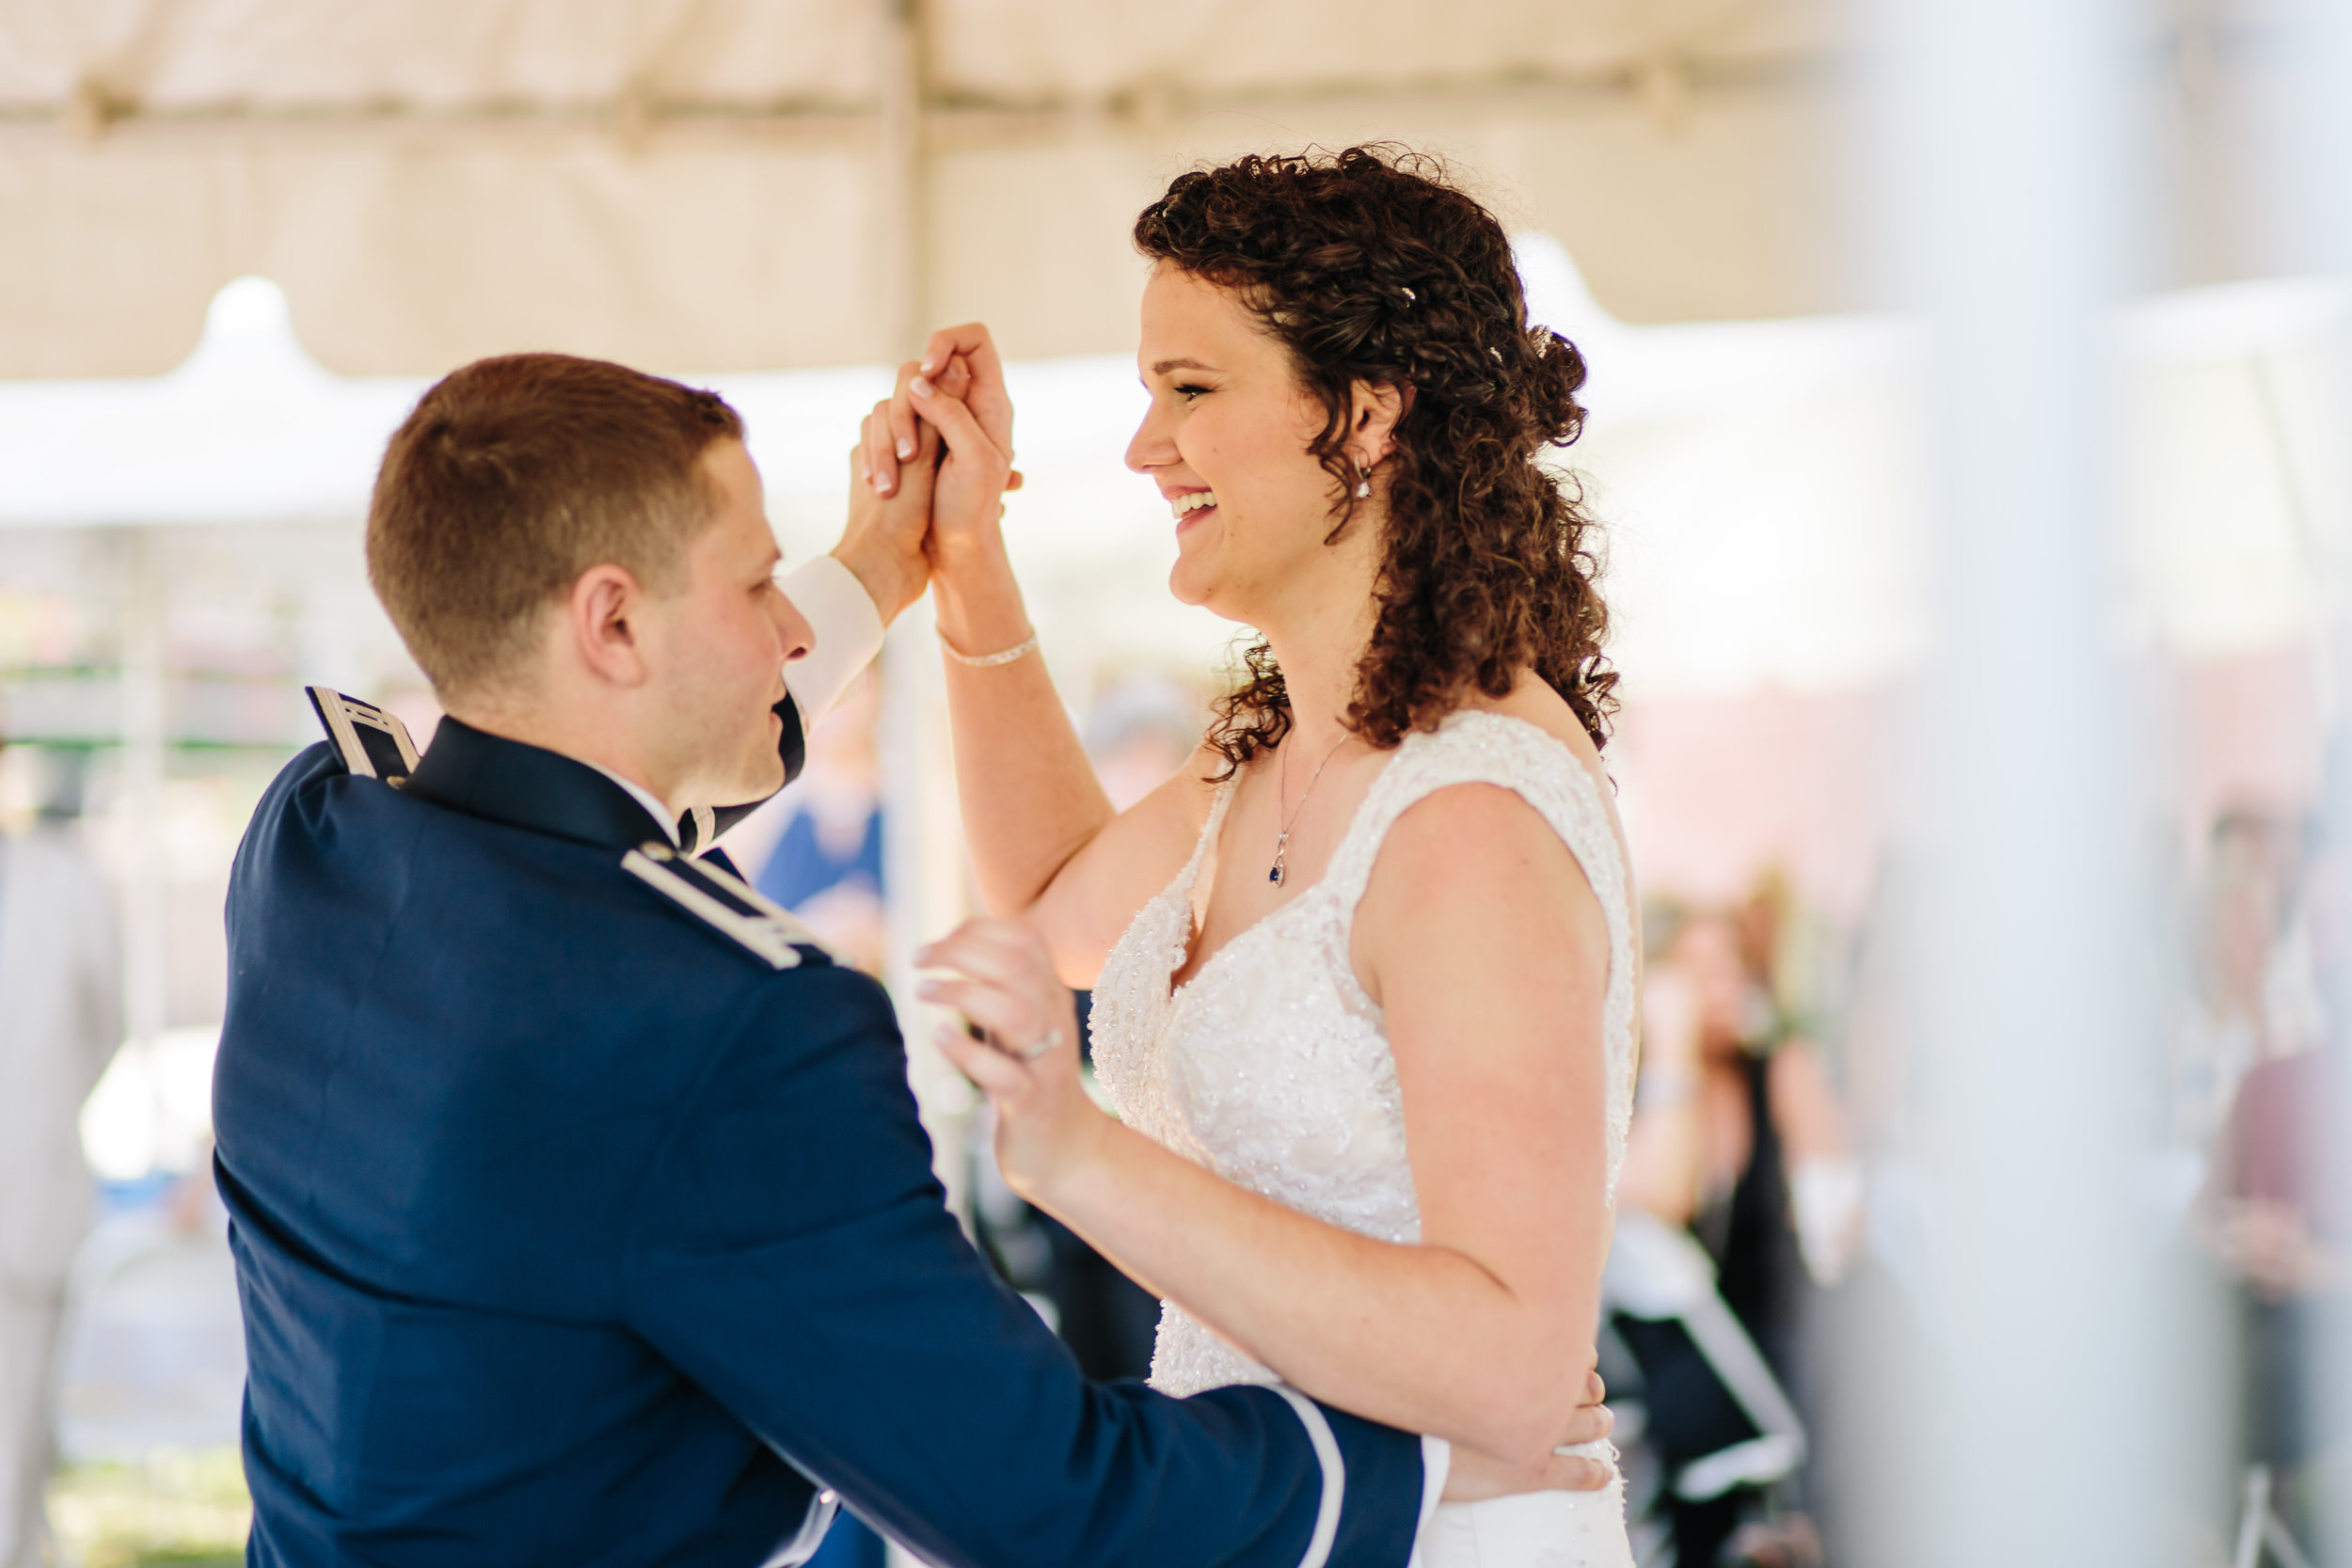 2018.03.17 Allison and Chuck Wedding Waelti Melbourne (569 of 569).jpg